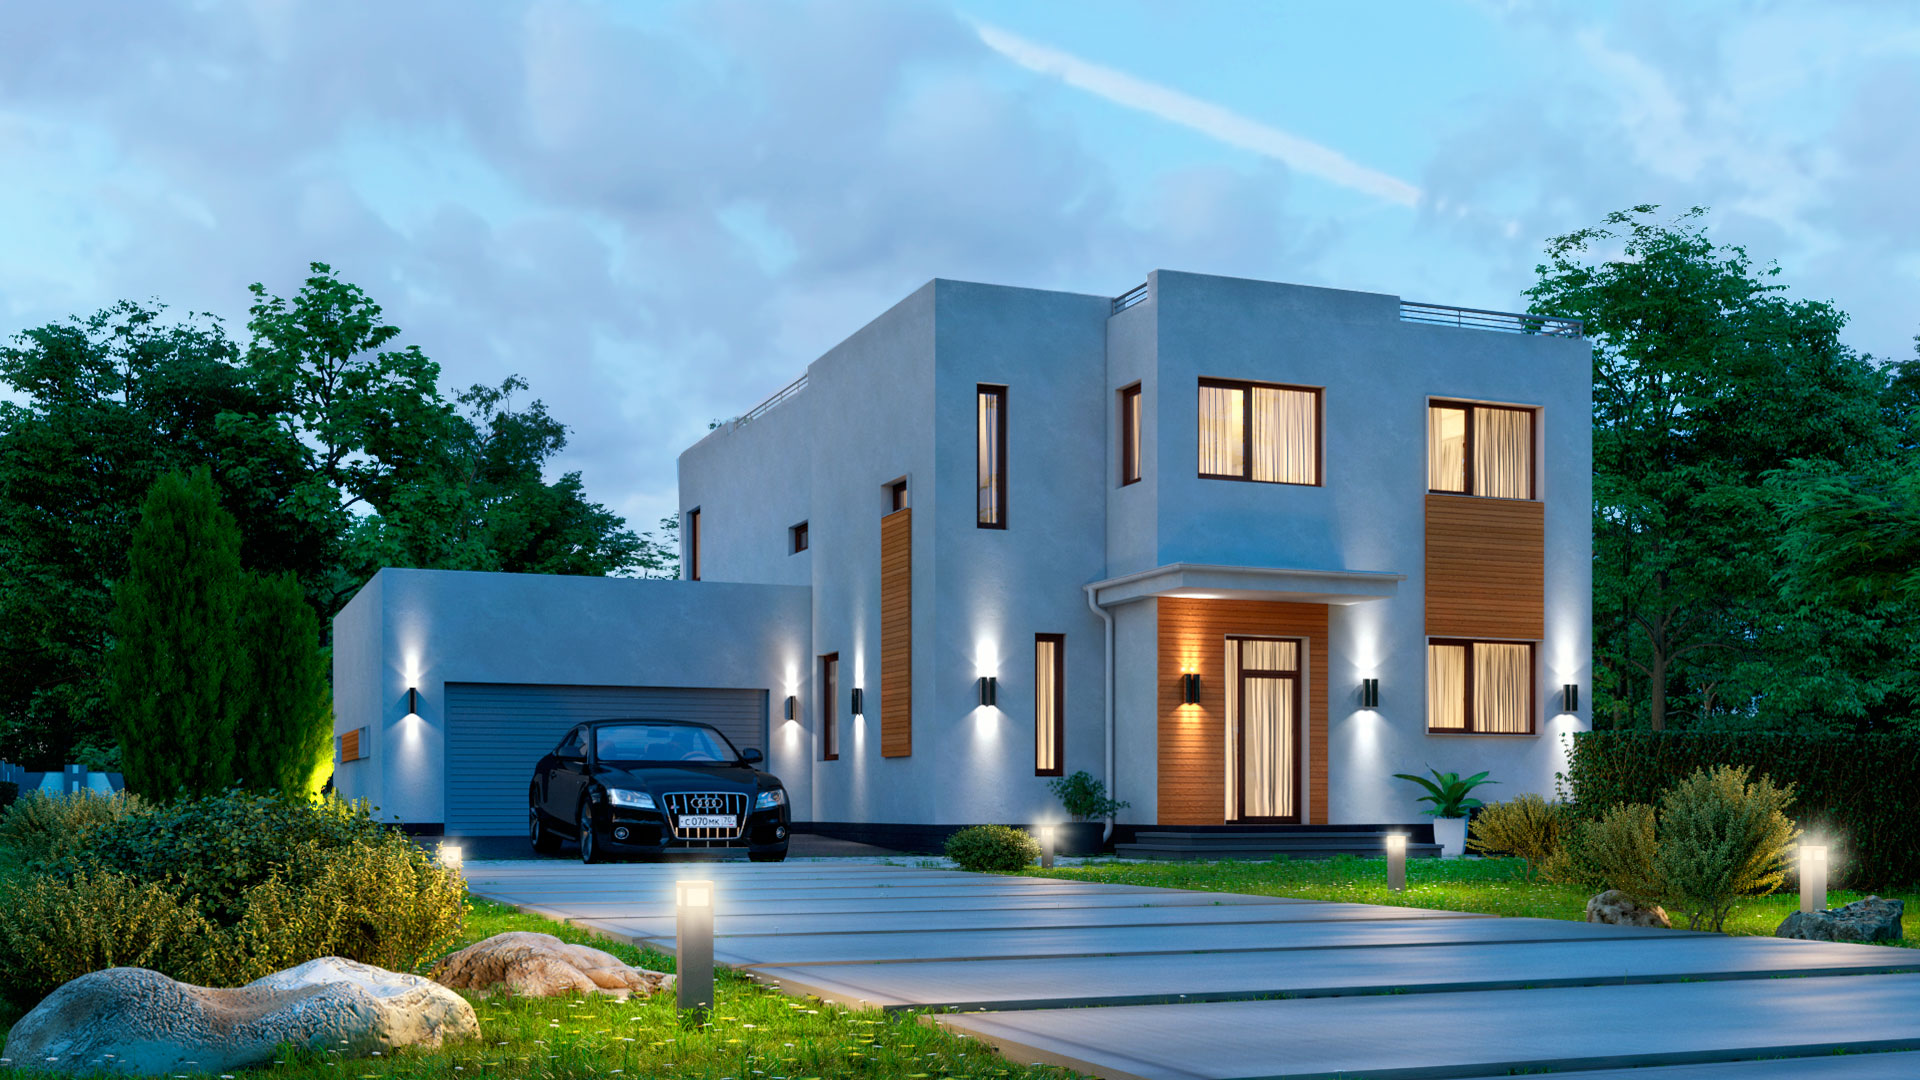 Вечернее фото двухэтажного дома 15 на 15, проект БЭНПАН БП-289.